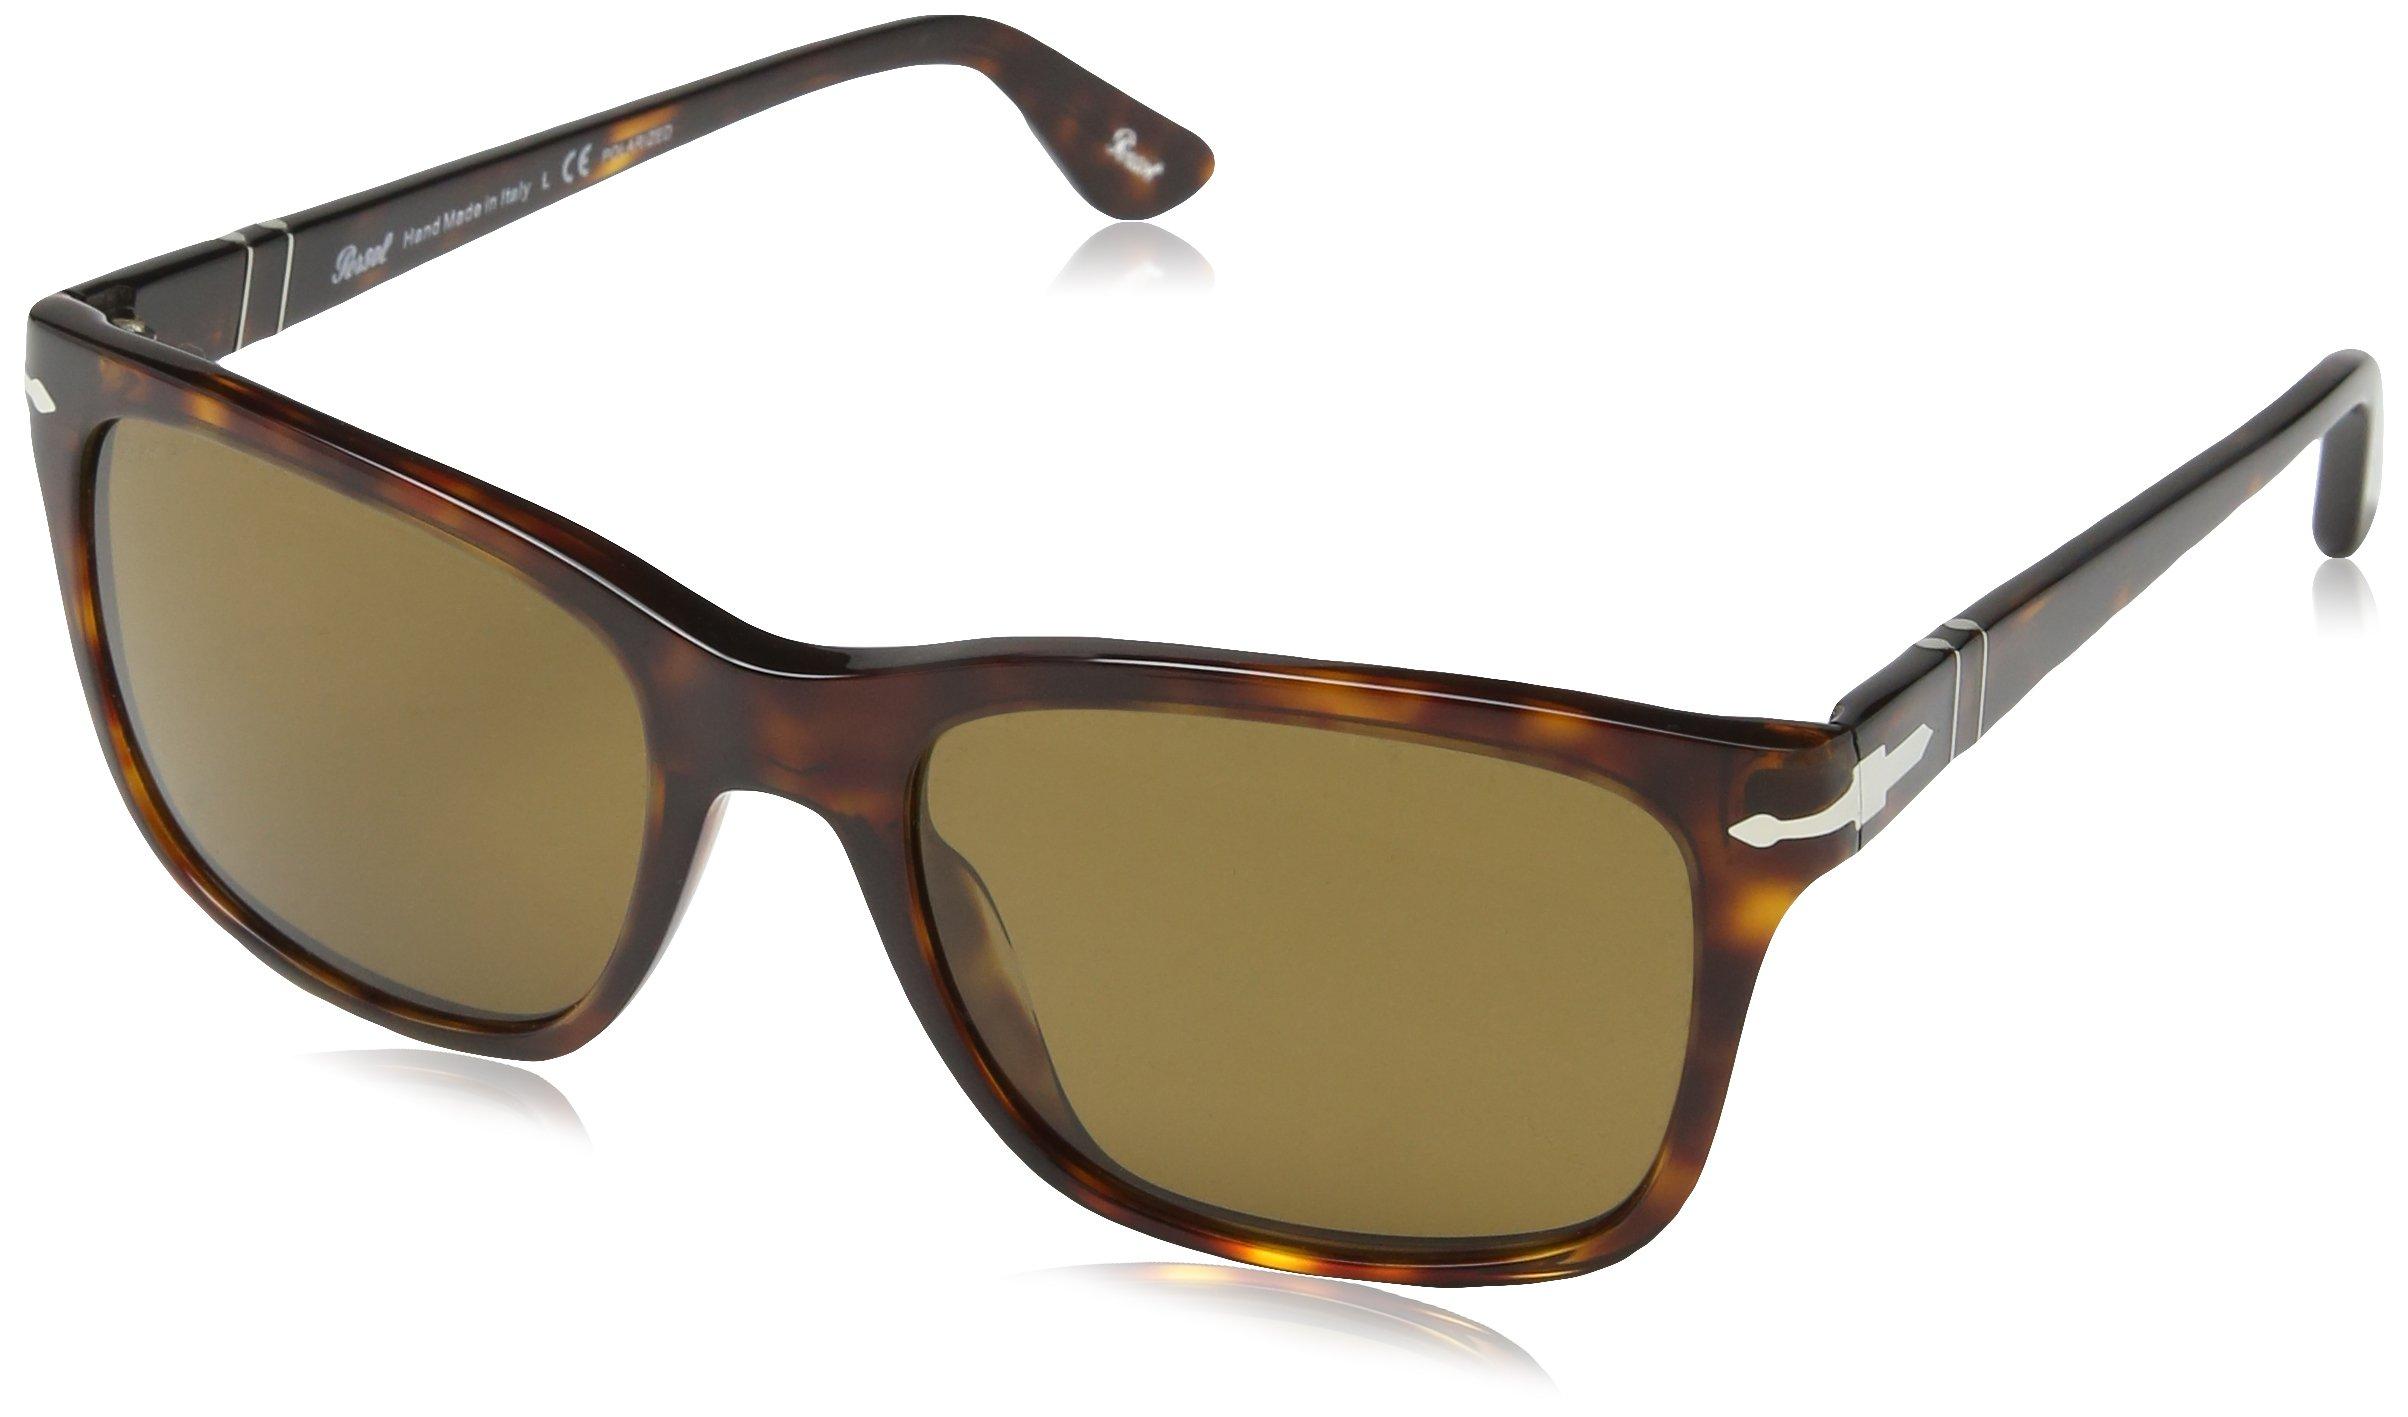 Persol PO3135S Sunglasses - 24/57 Havana (Brown Polarized Lens) - 55mm